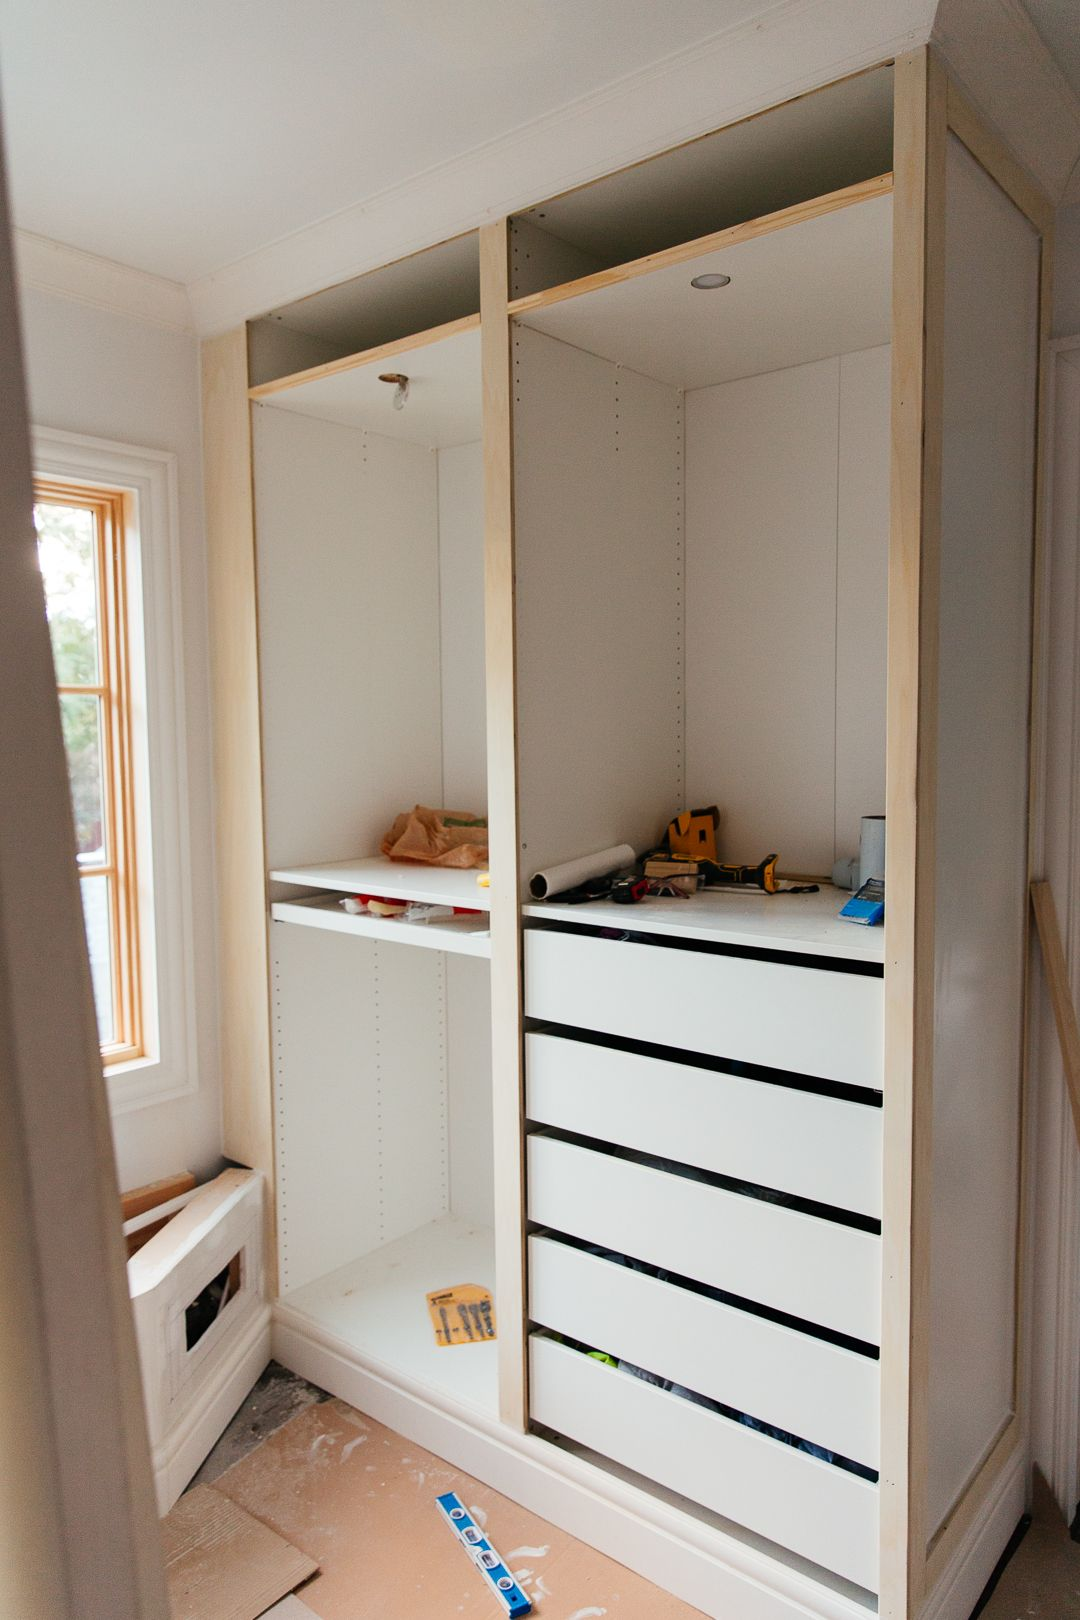 Hacking the IKEA Pax into a Fully Custom Closet Walk in